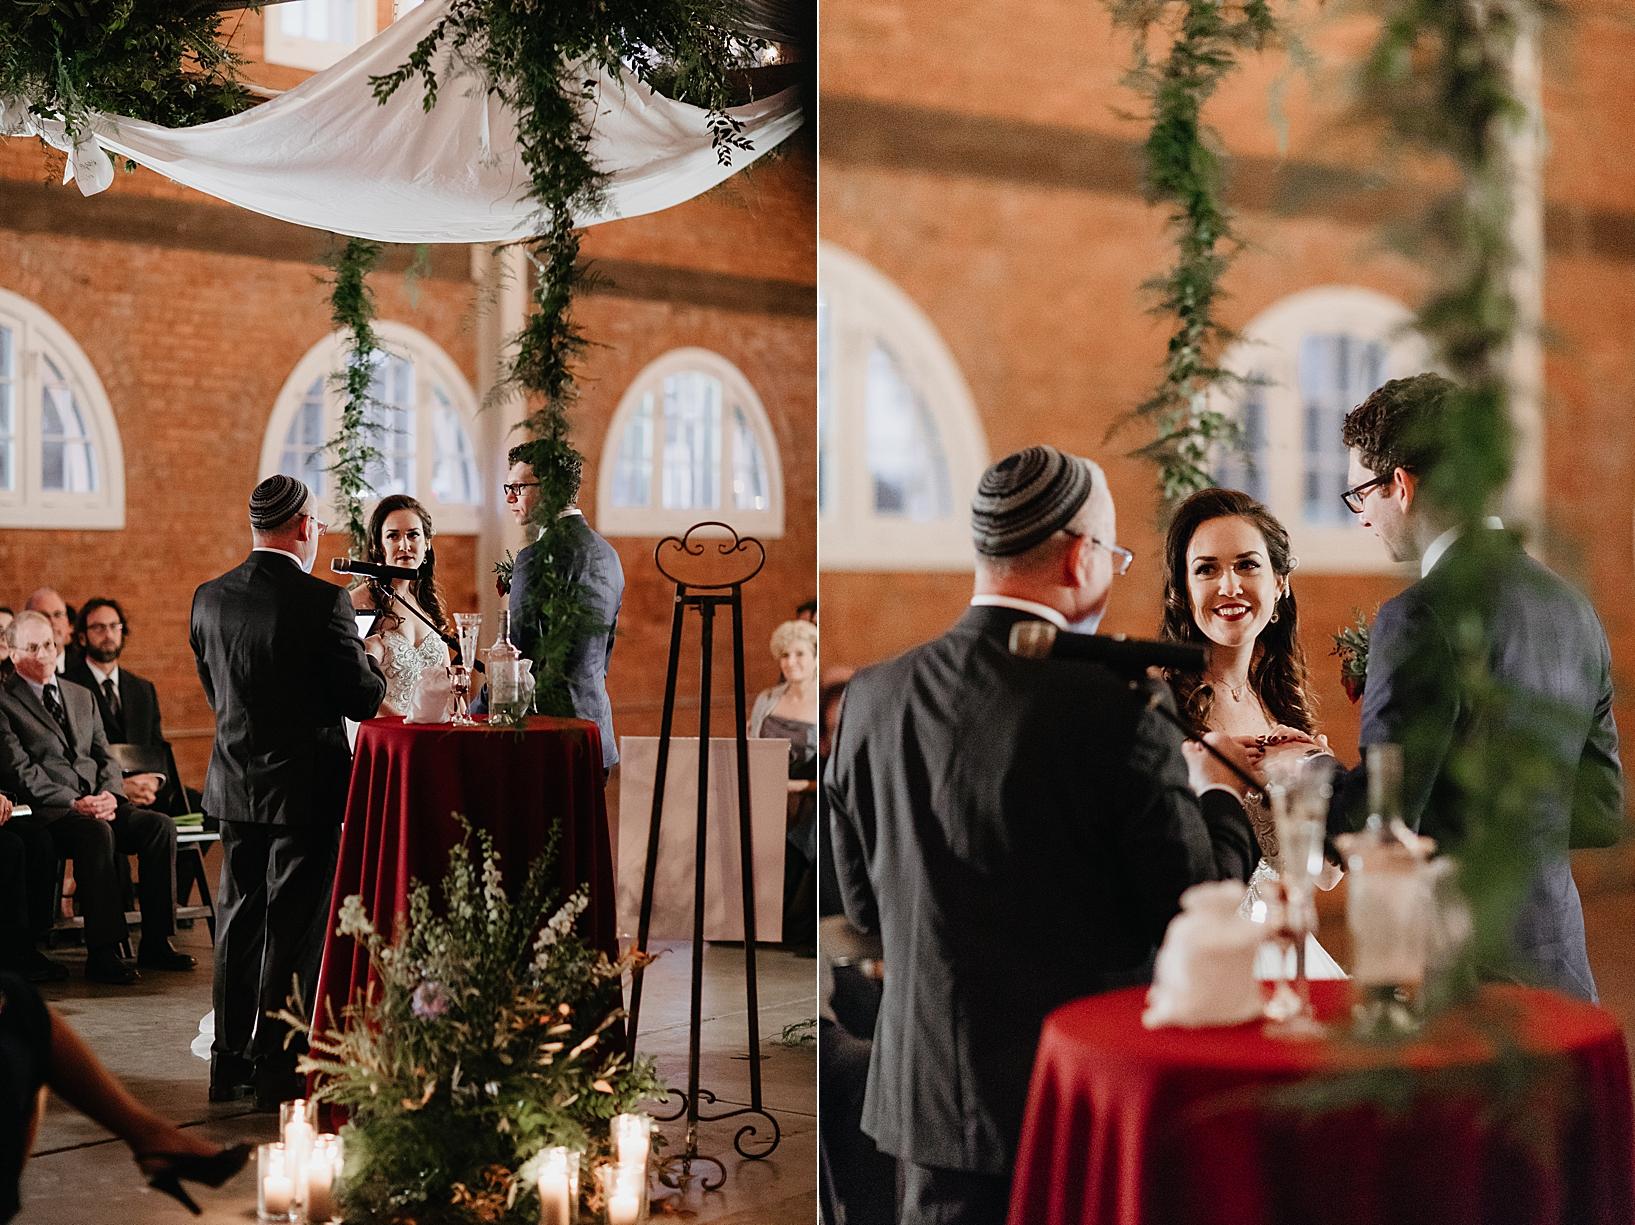 Brick-San-Diego-Winter-Wedding-54.jpg